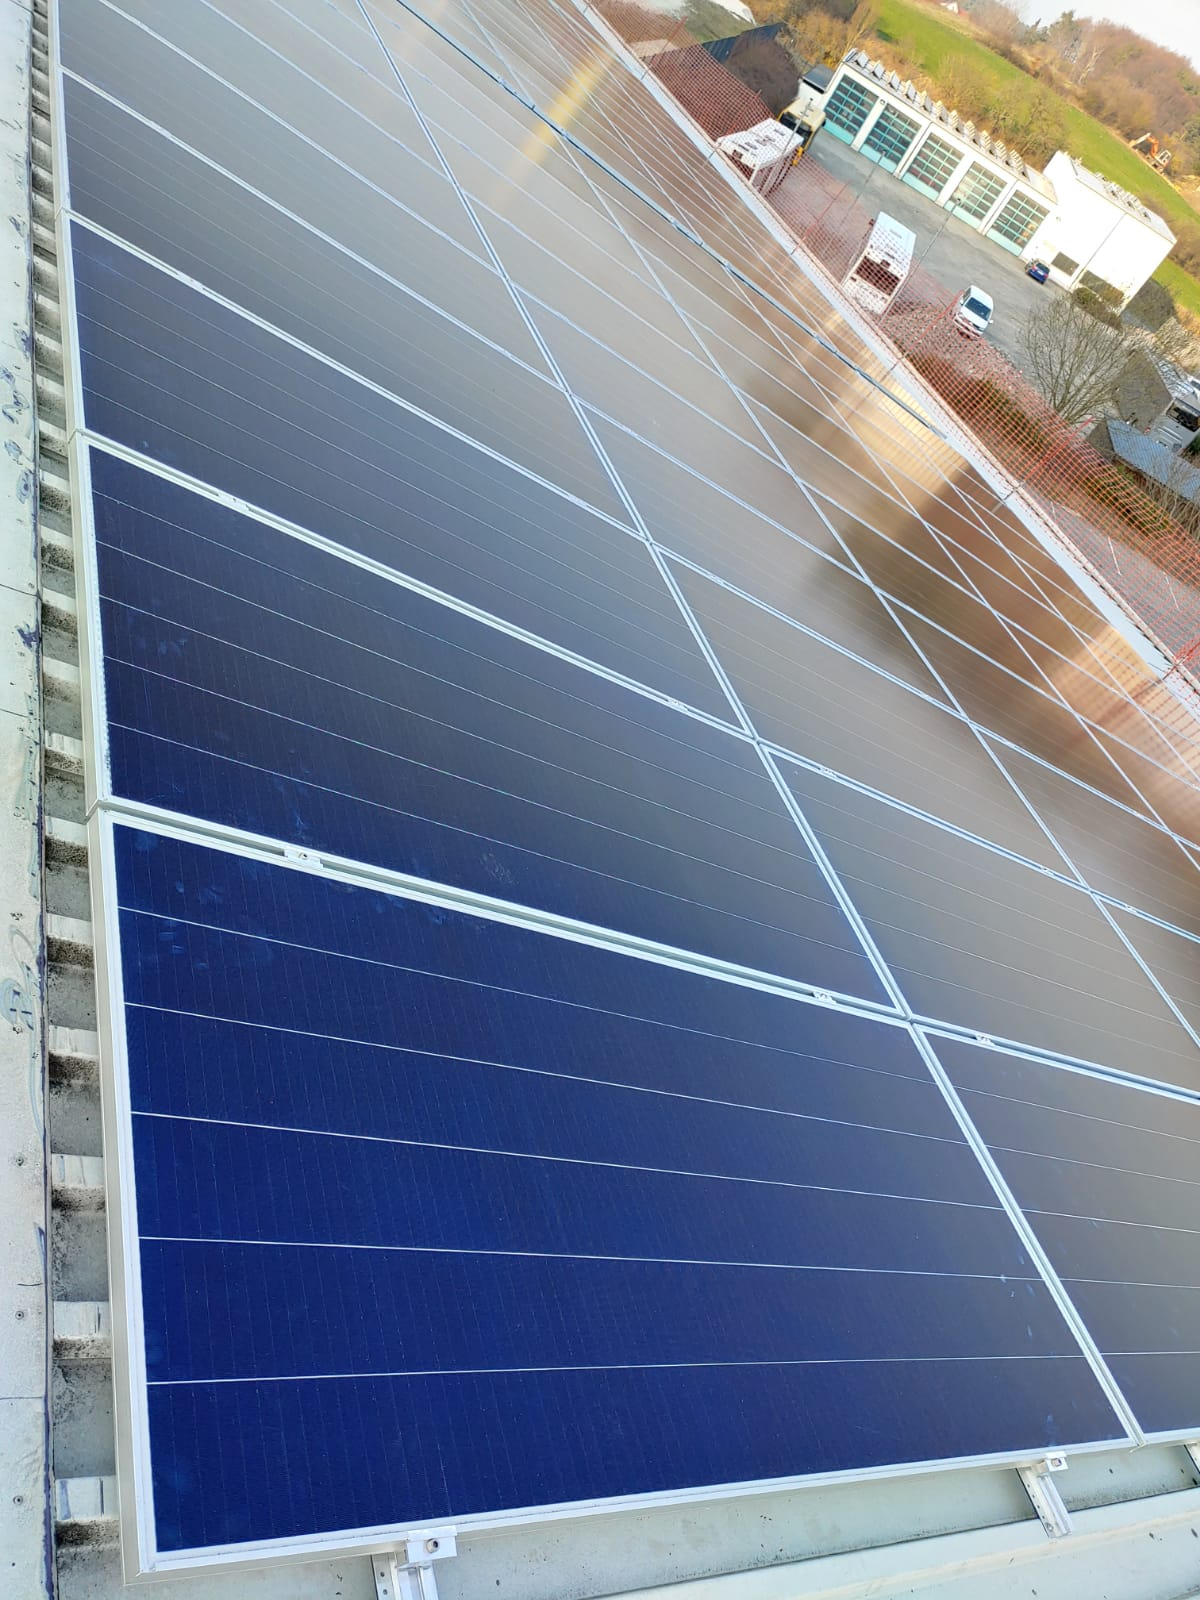 Sunpower 625 Watt Solarmodul